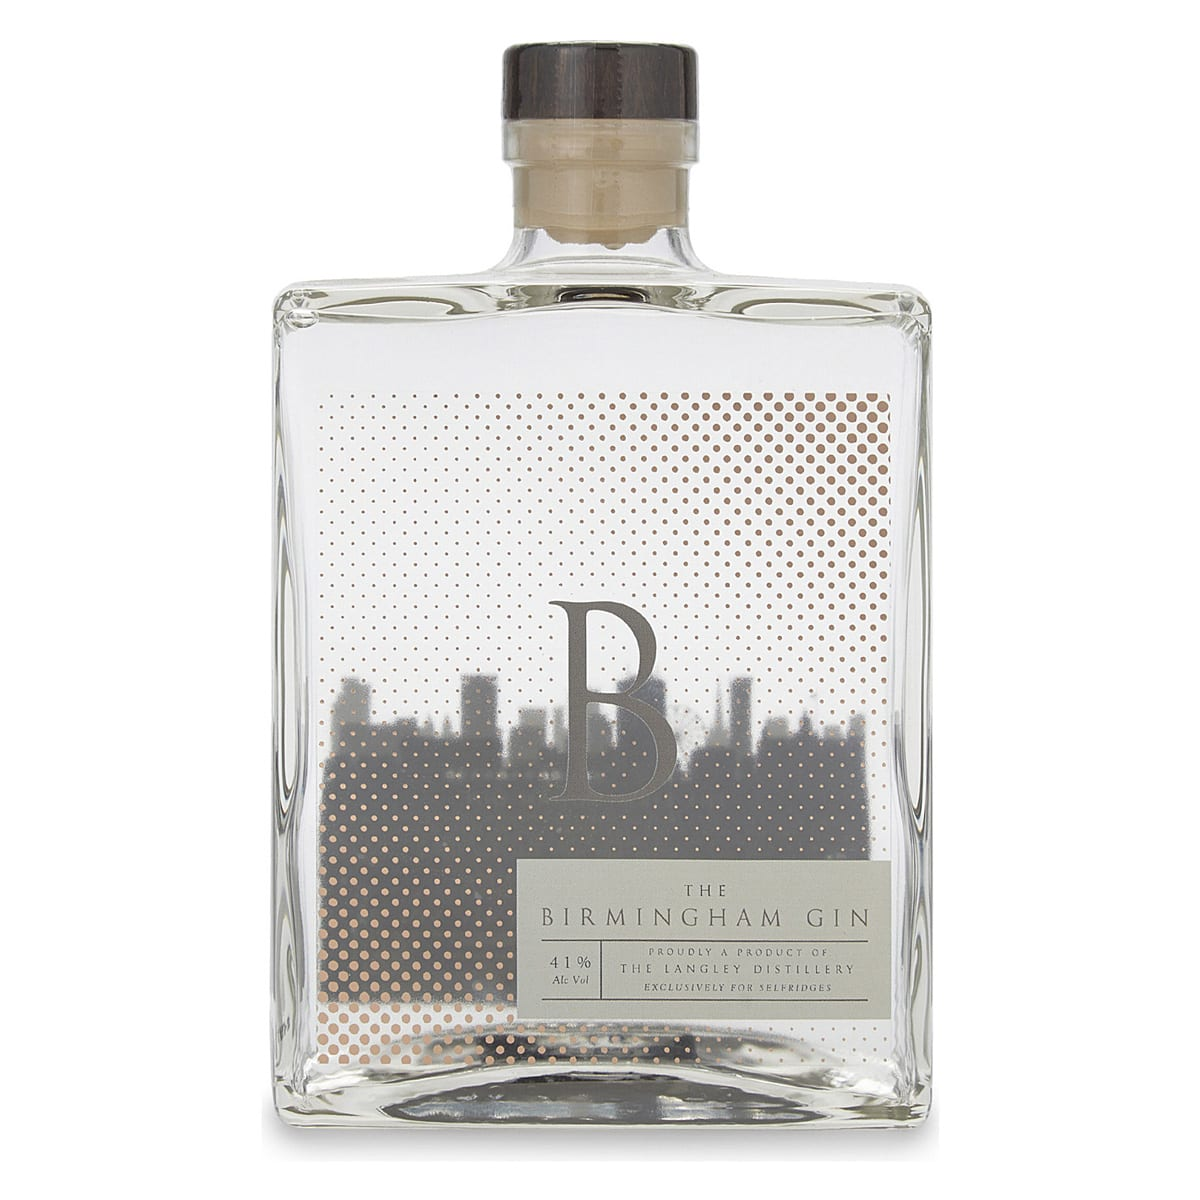 The Birmingham Gin